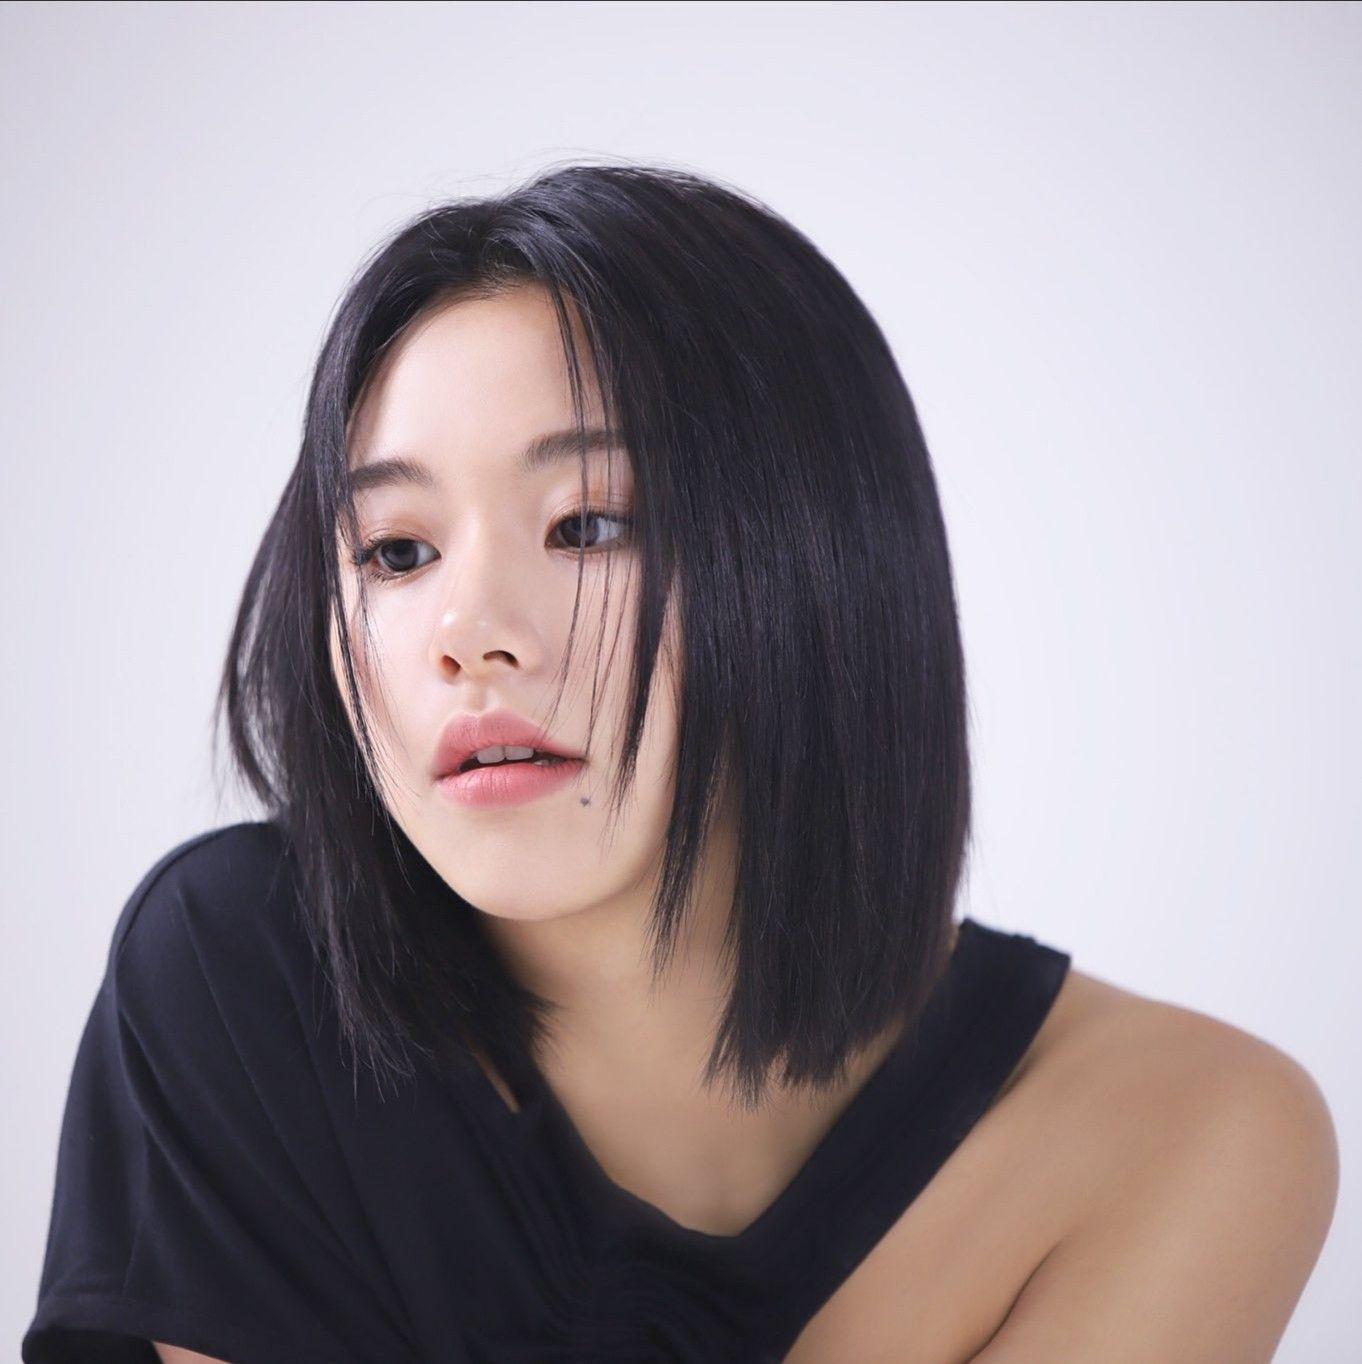 Chaeyoung Black Hair Kpop Kpop Short Hair Short Hair Styles